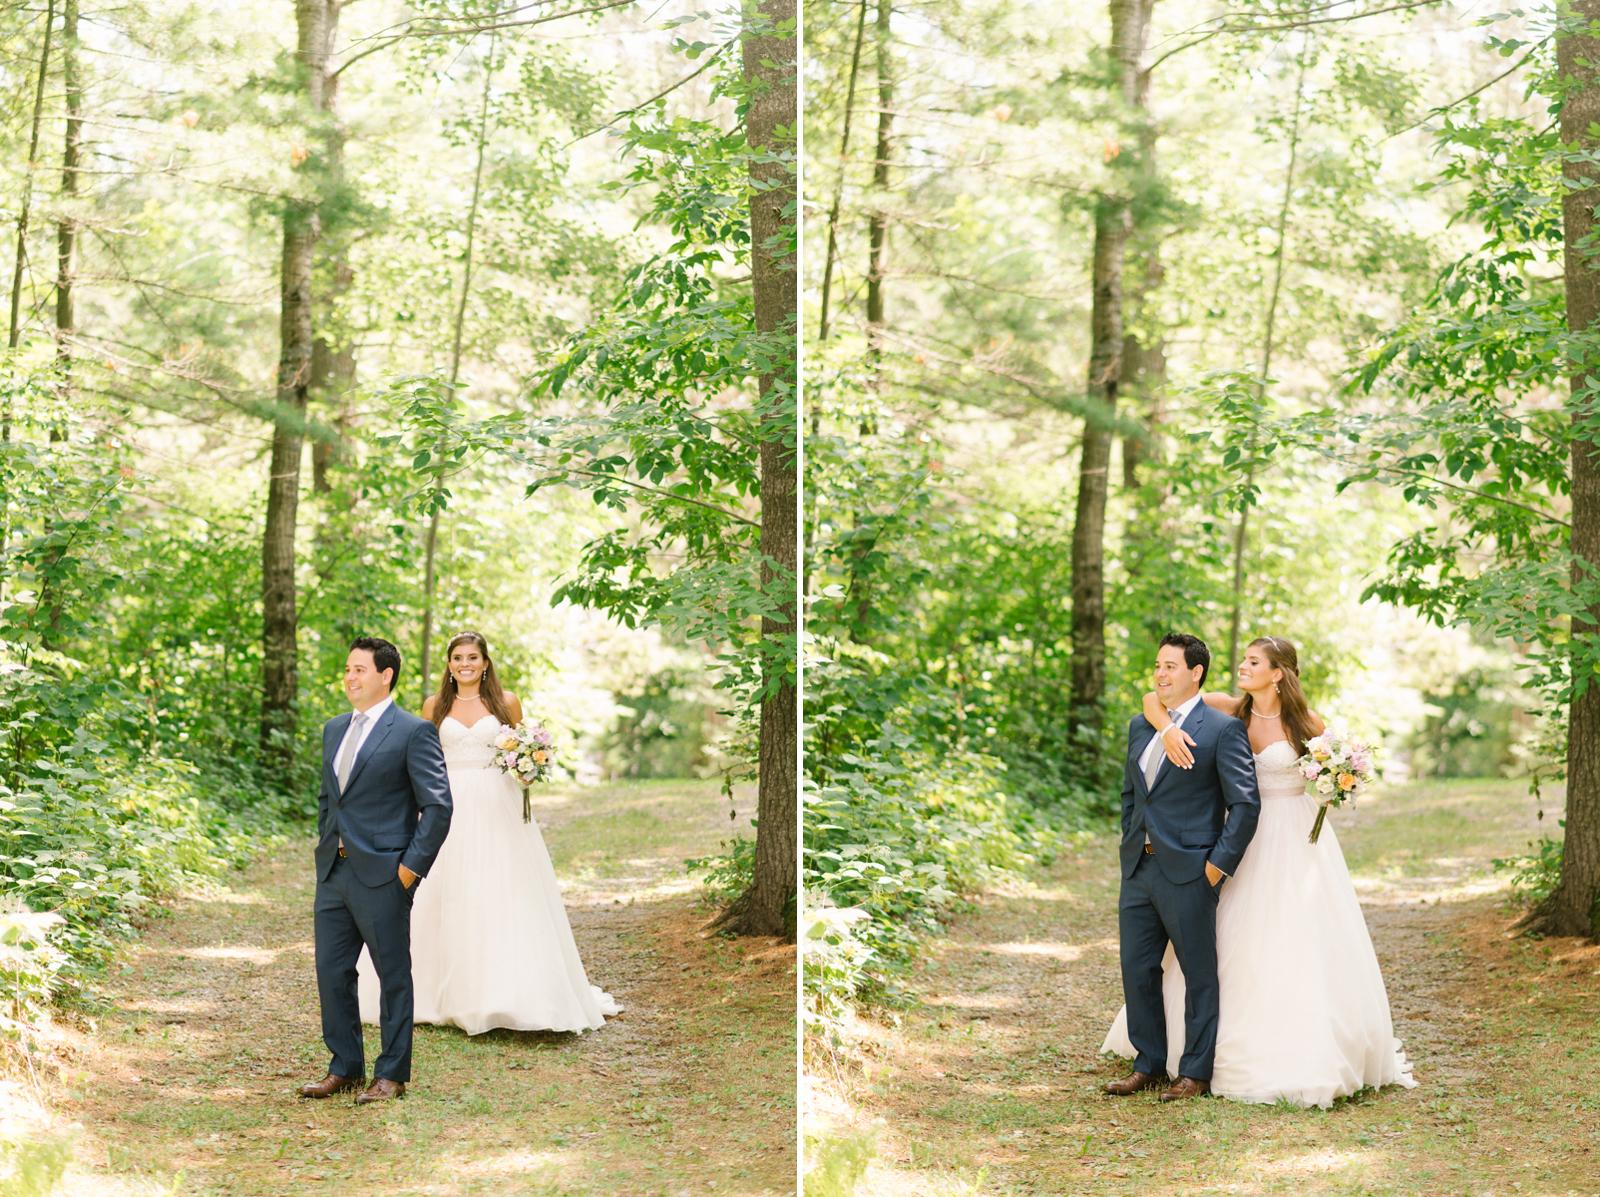 tara mcmullen photography muskoka wedding photographer st peters on the rock wedding photos muskoka wedding photos where to get married in muskoka camp ooch wedding-009